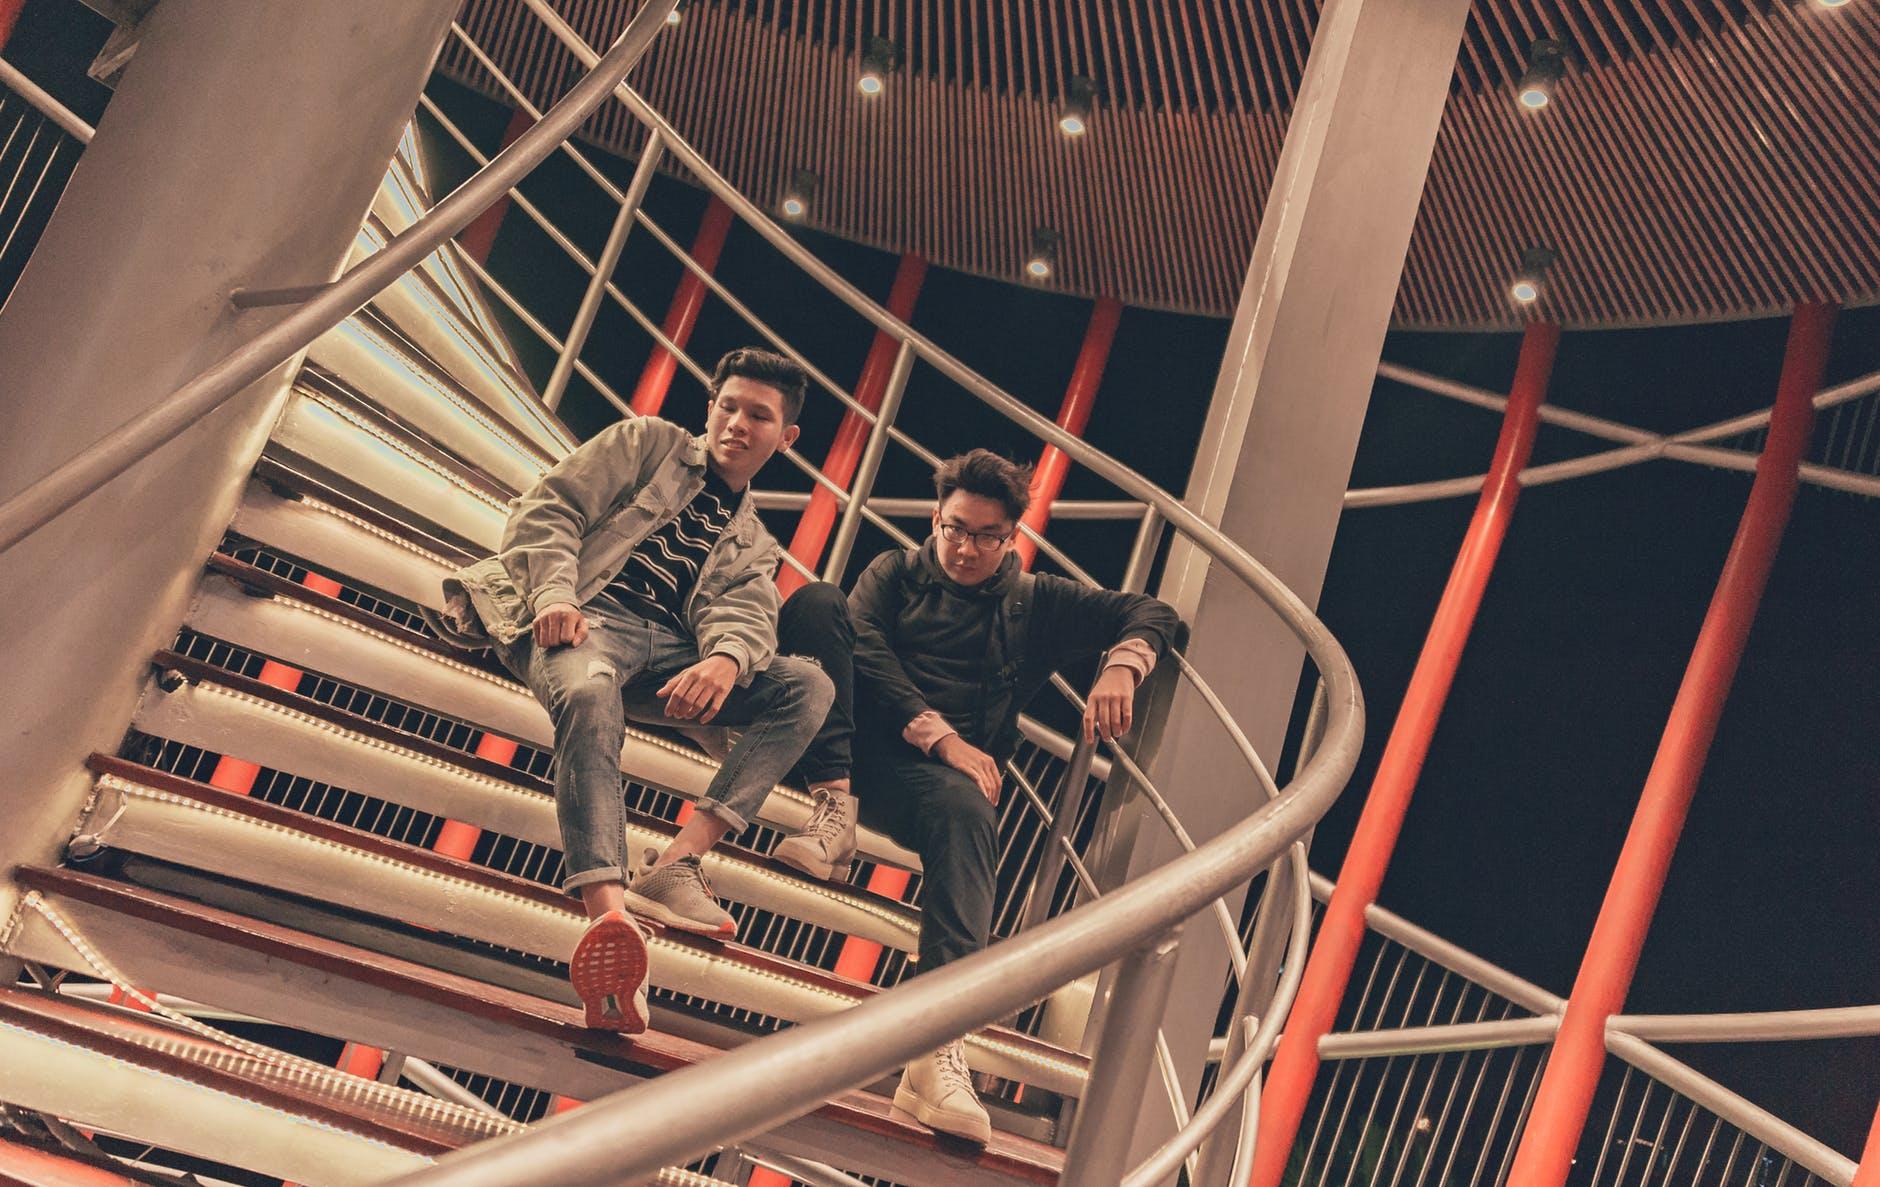 Two men sitting on spiral stairway photo